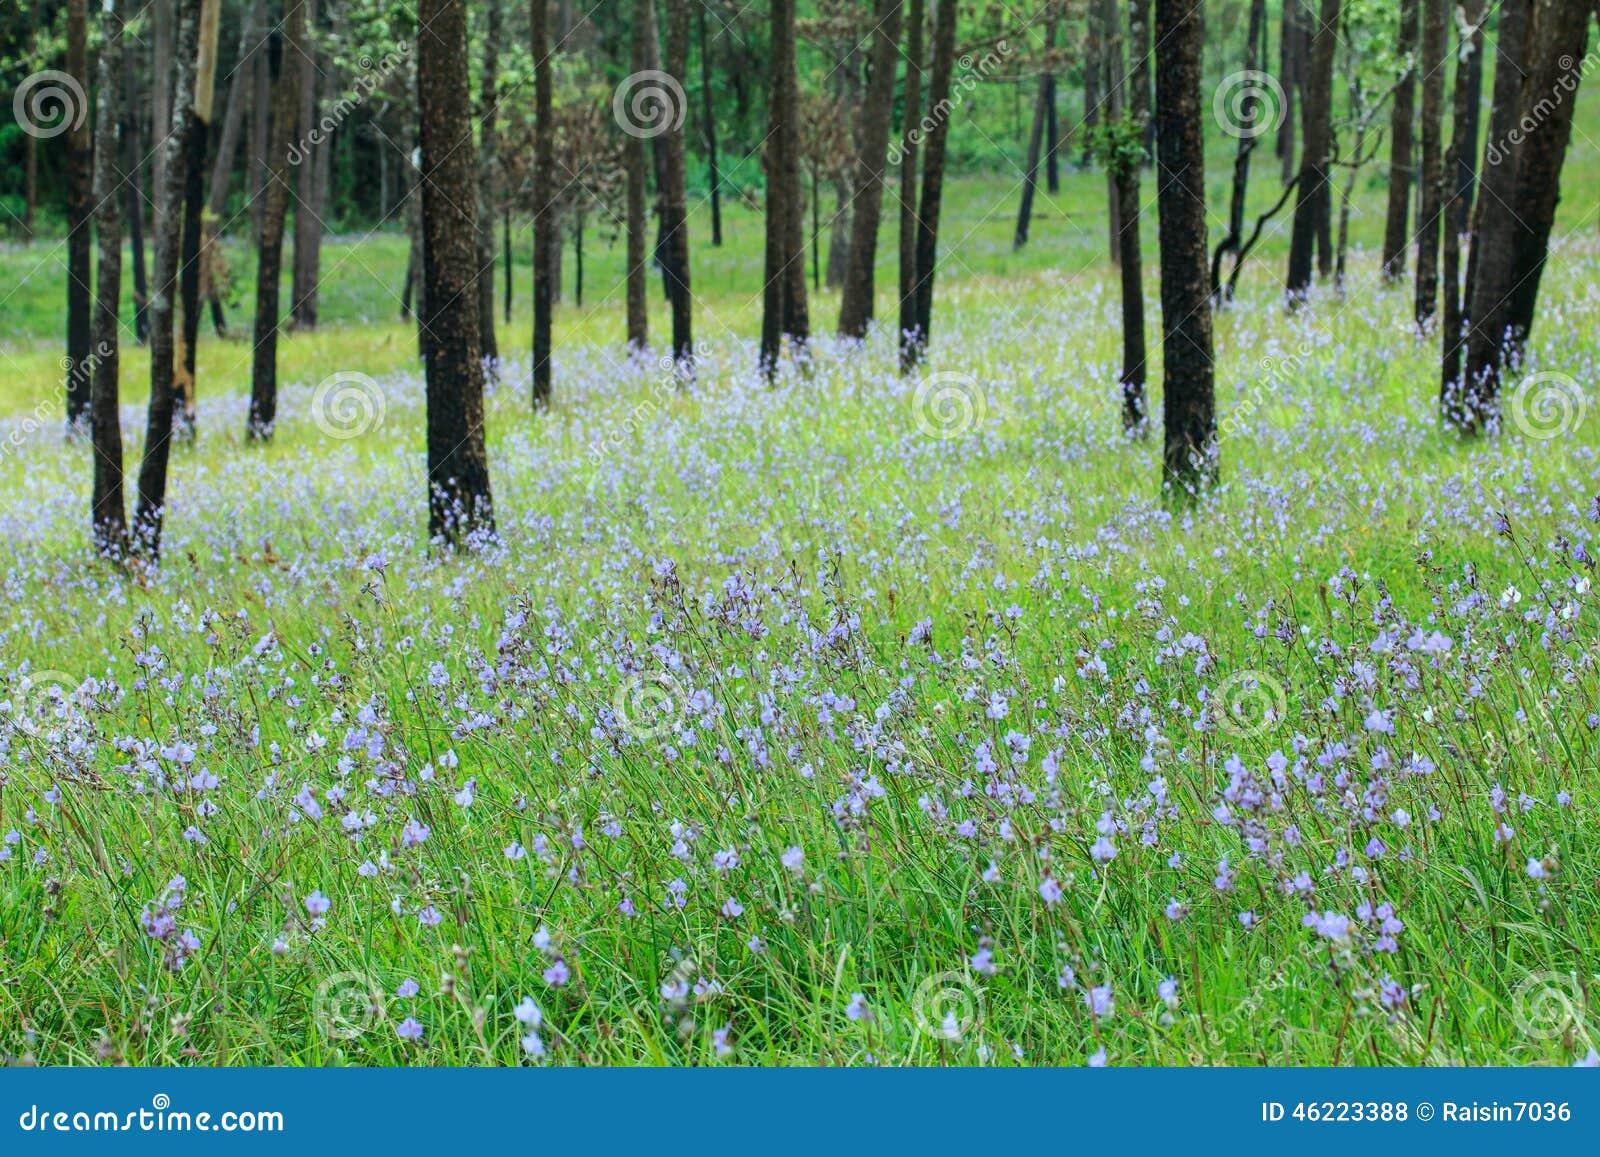 Pine Tree Garden In Blossom, Phoosoidao National Park Thailand